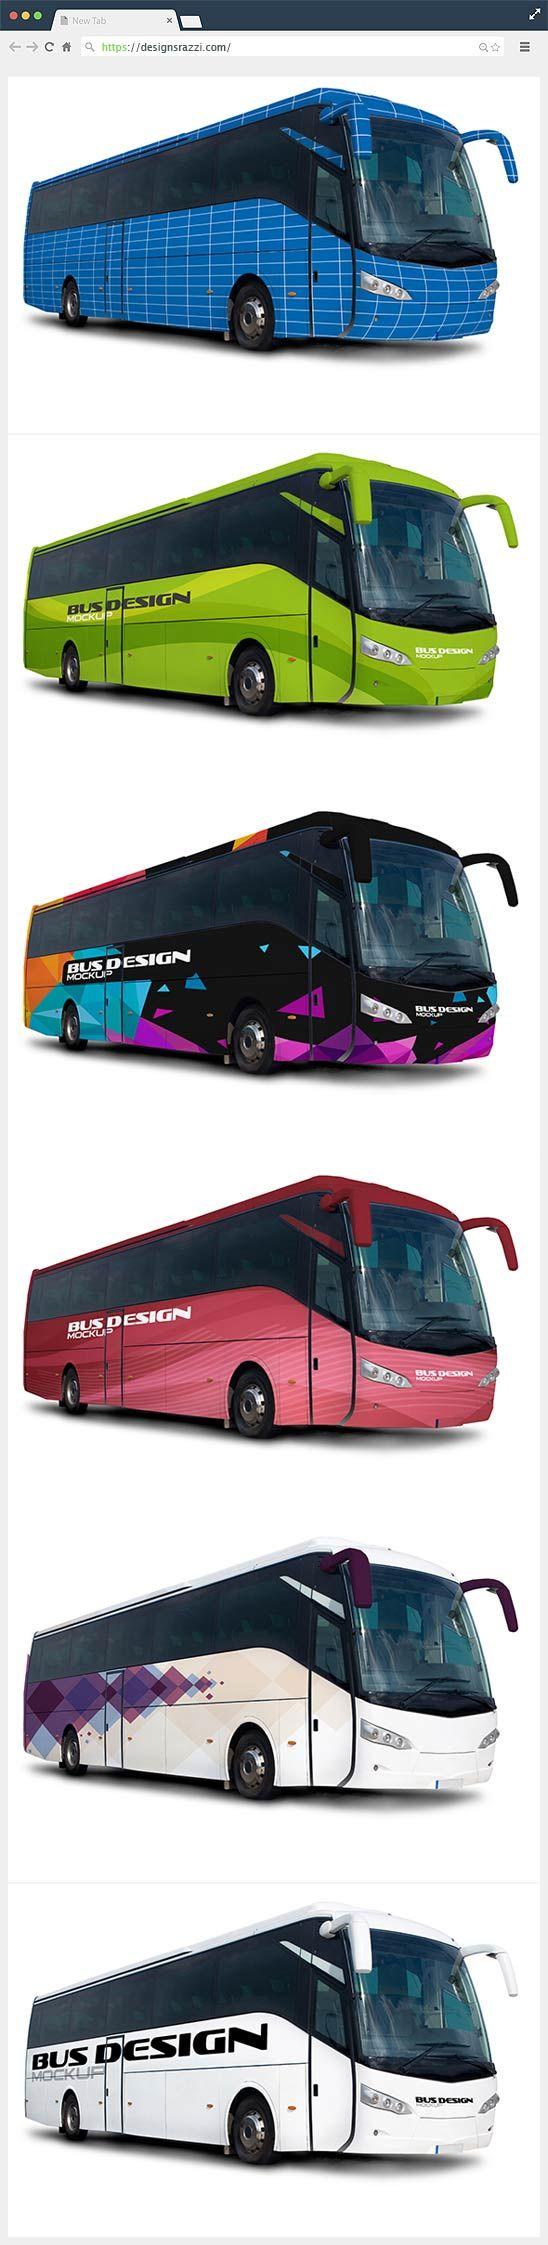 Bus Design Free Psd Mockup Designrazzi Mockup Free Psd Mockup Psd Photoshop Mockup